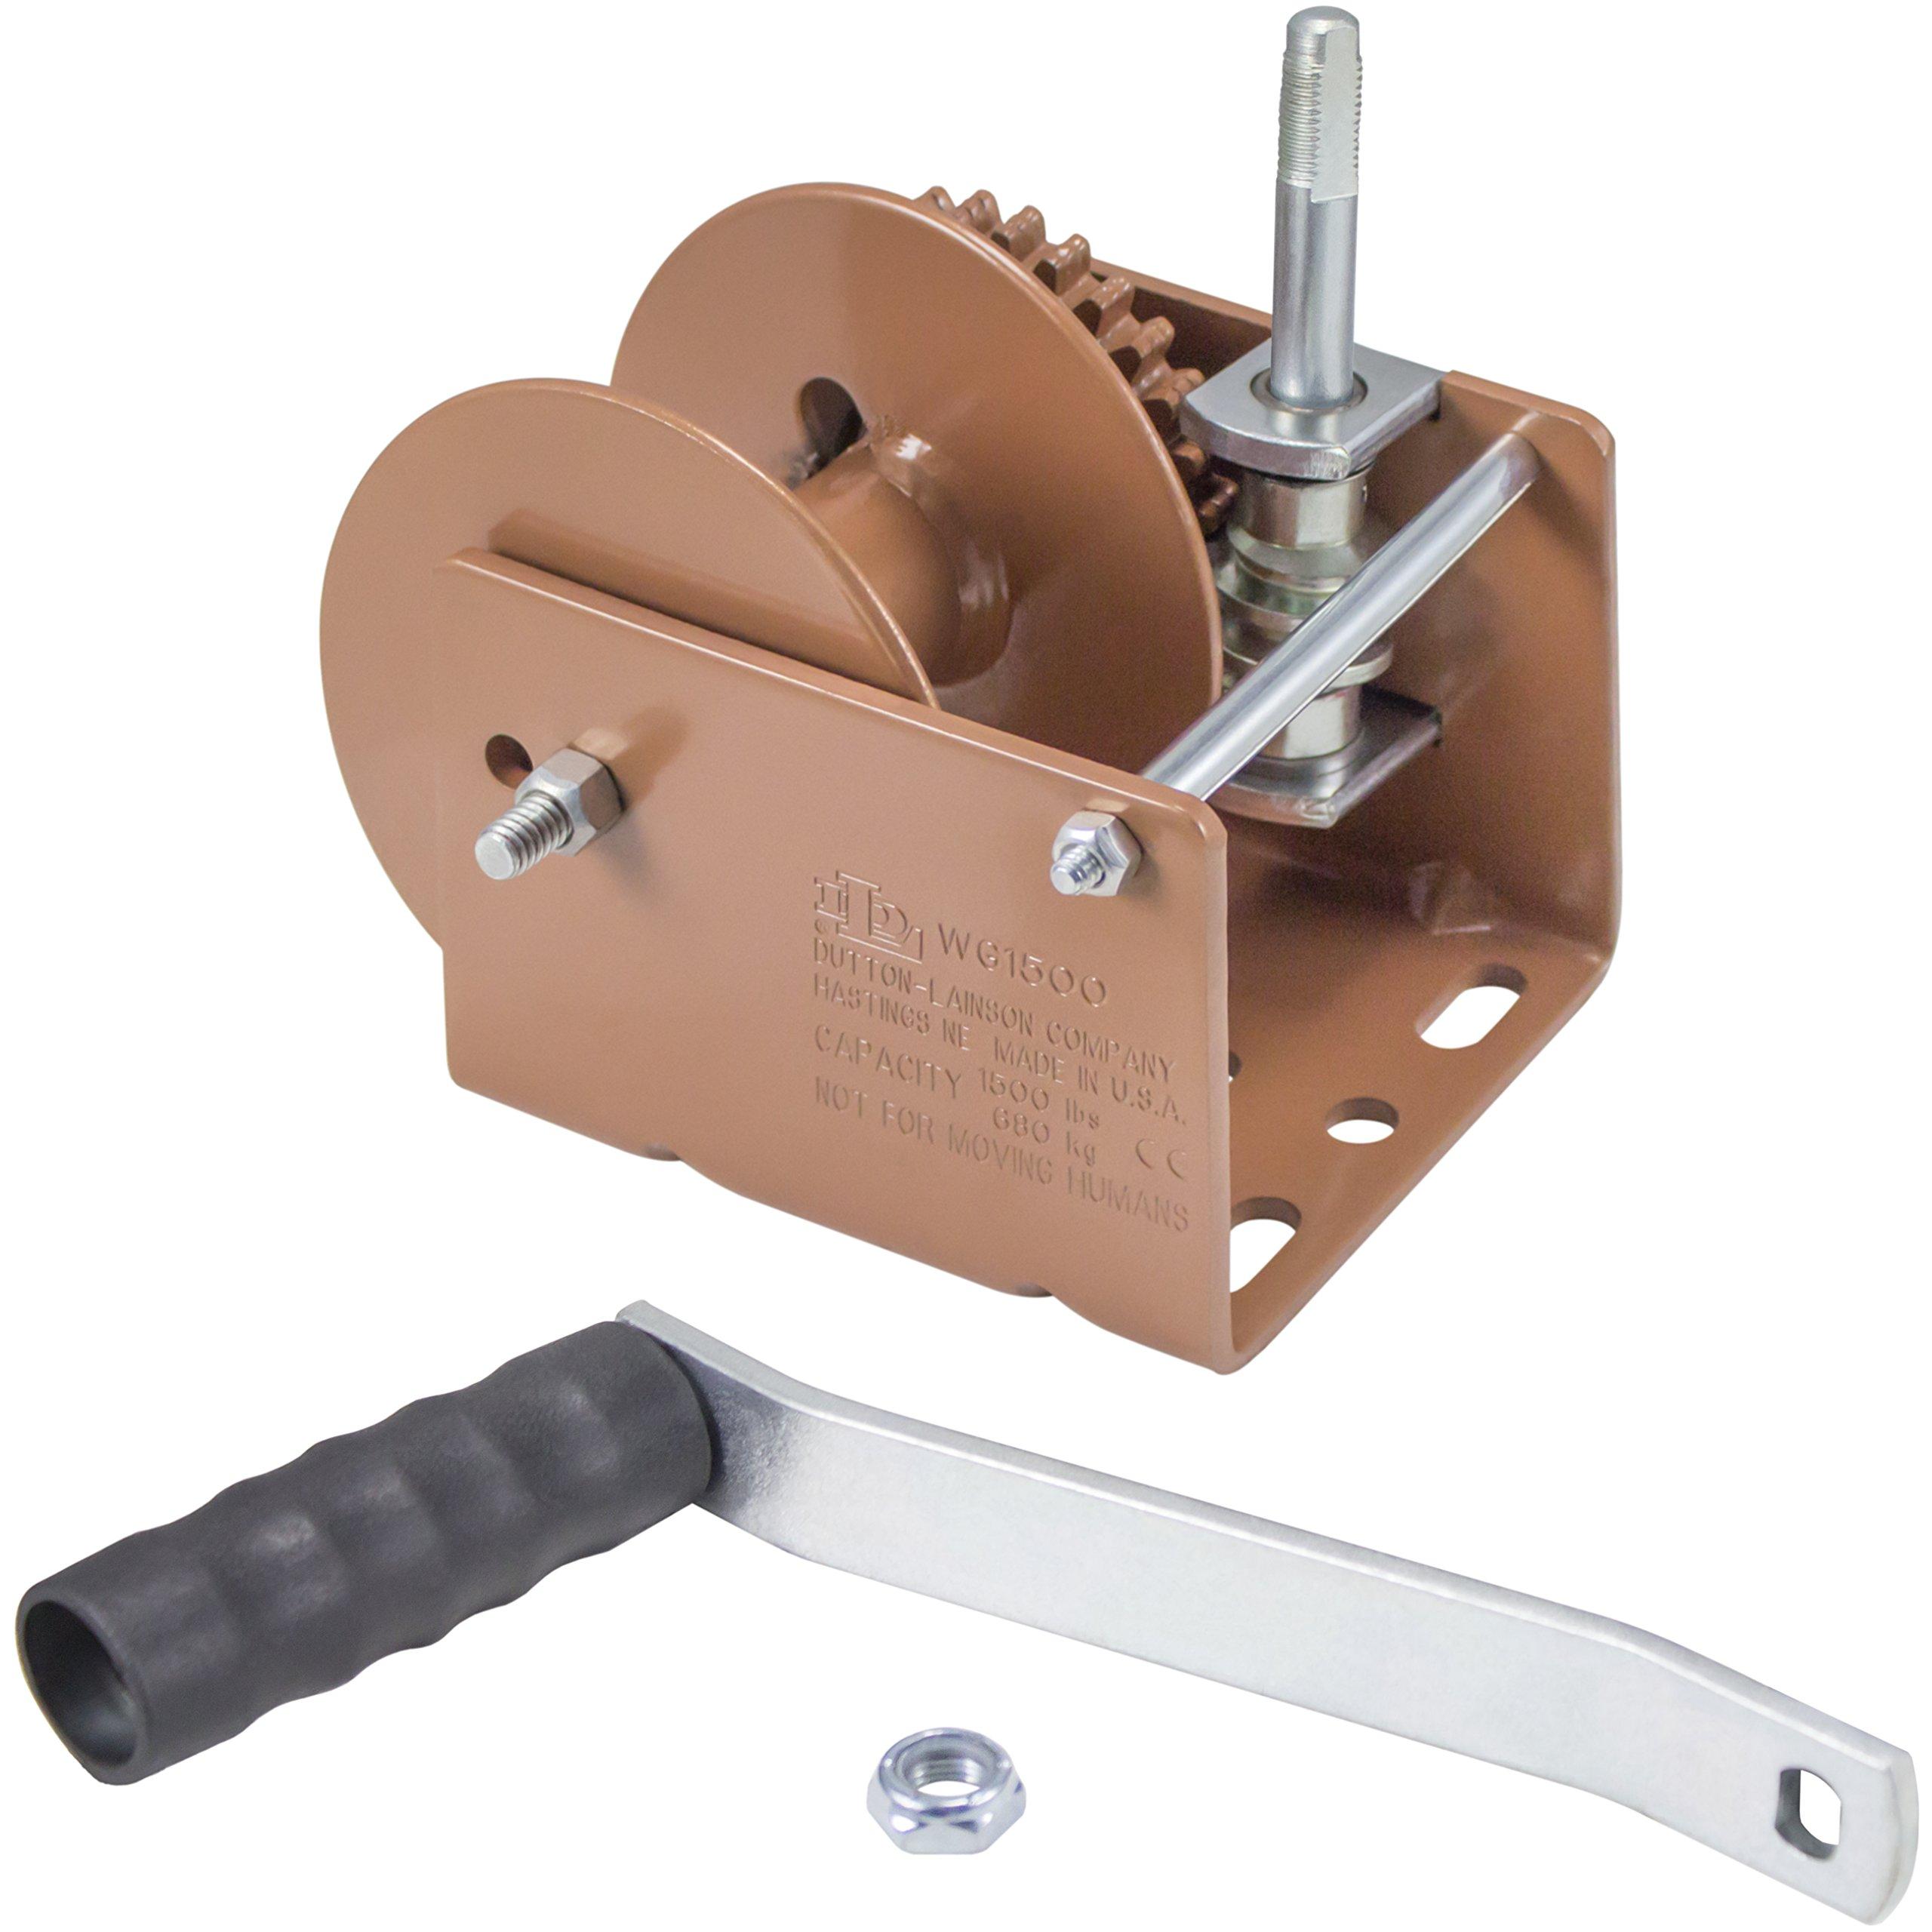 Dutton-Lainson Company WG1500 Worm Gear Winch - 1500 lb. Load Capacity by Dutton-Lainson Company